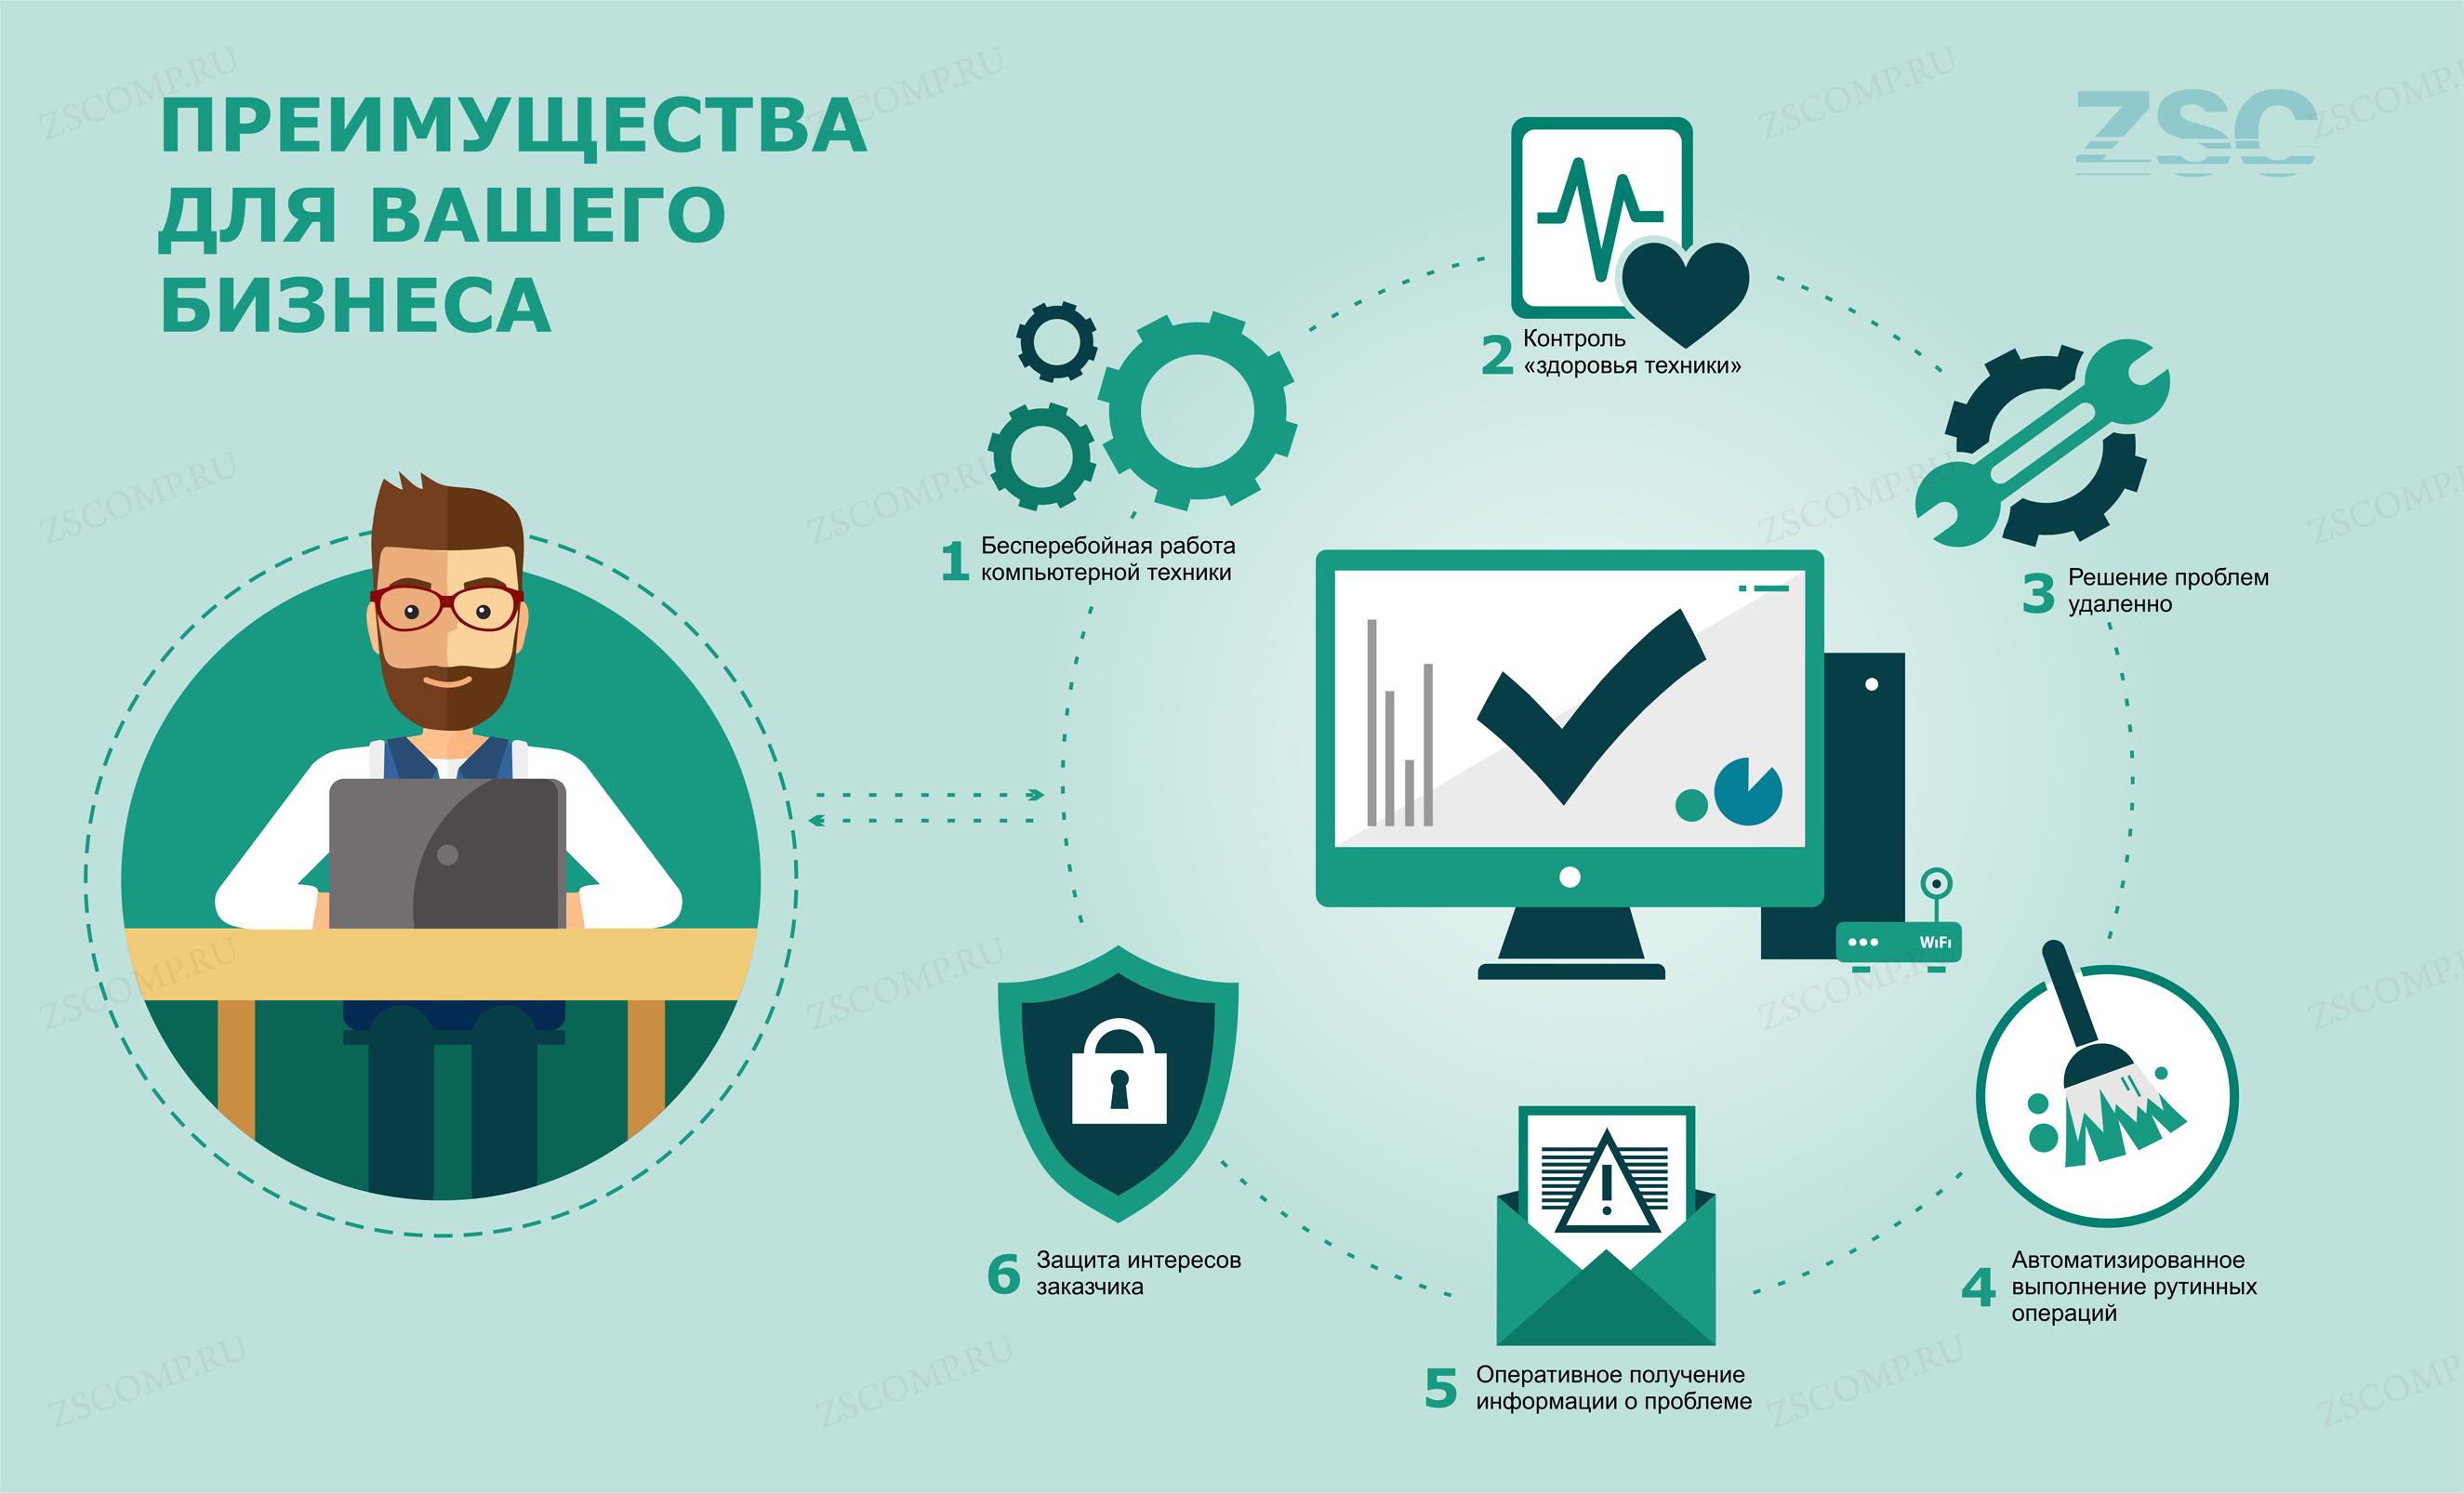 It аутсорсинг бизнес план договор на оказание бухгалтерских услуг на усн